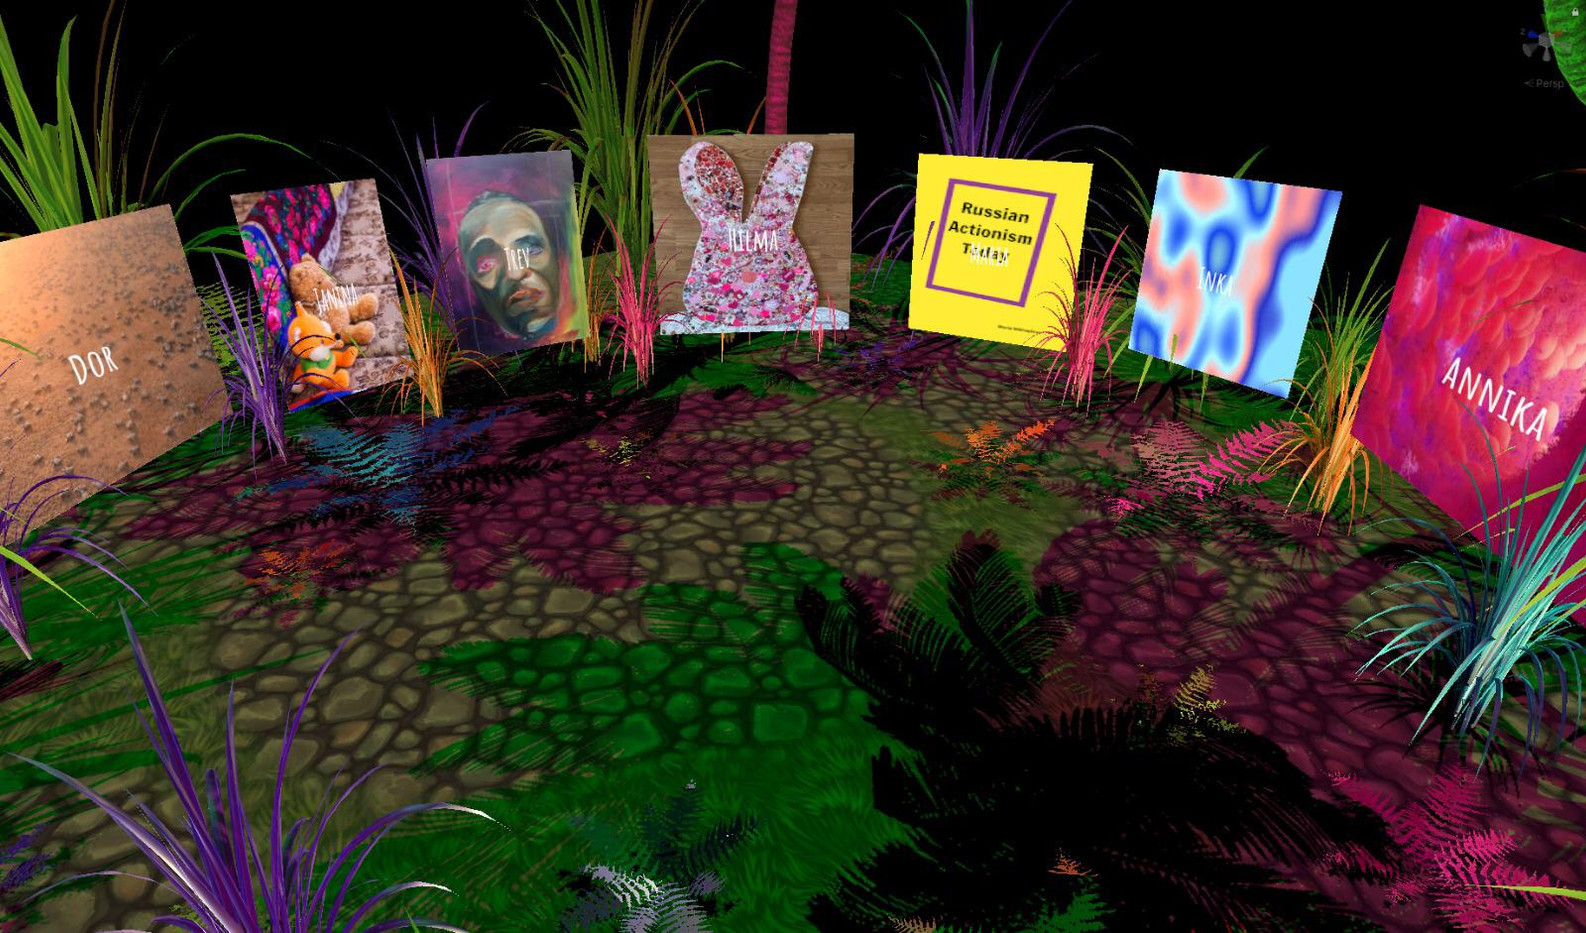 Virtual Gallery Main Room 2